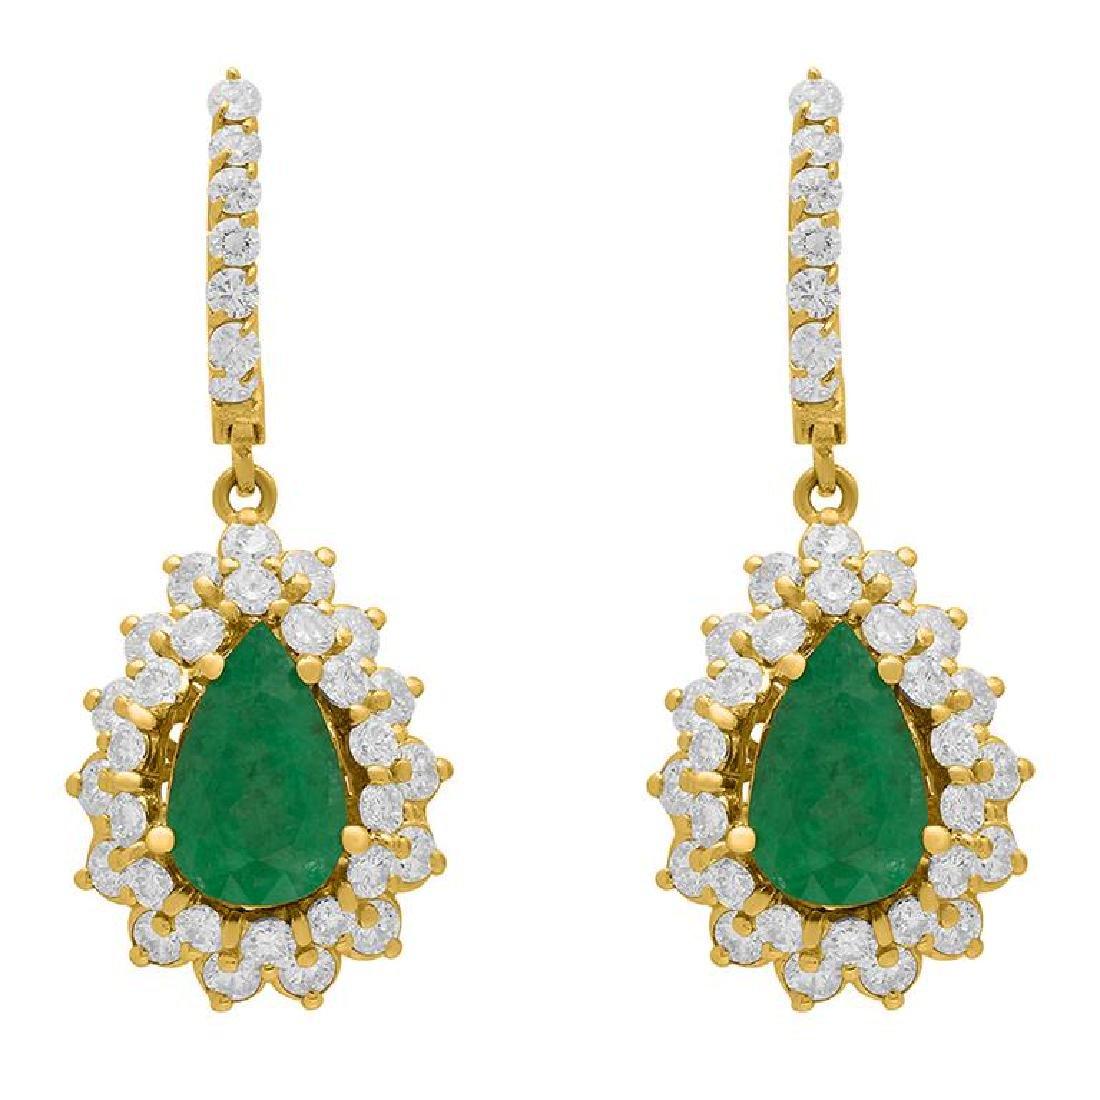 14k Yellow Gold 3.51ct Emerald 3.09ct Diamond Earrings